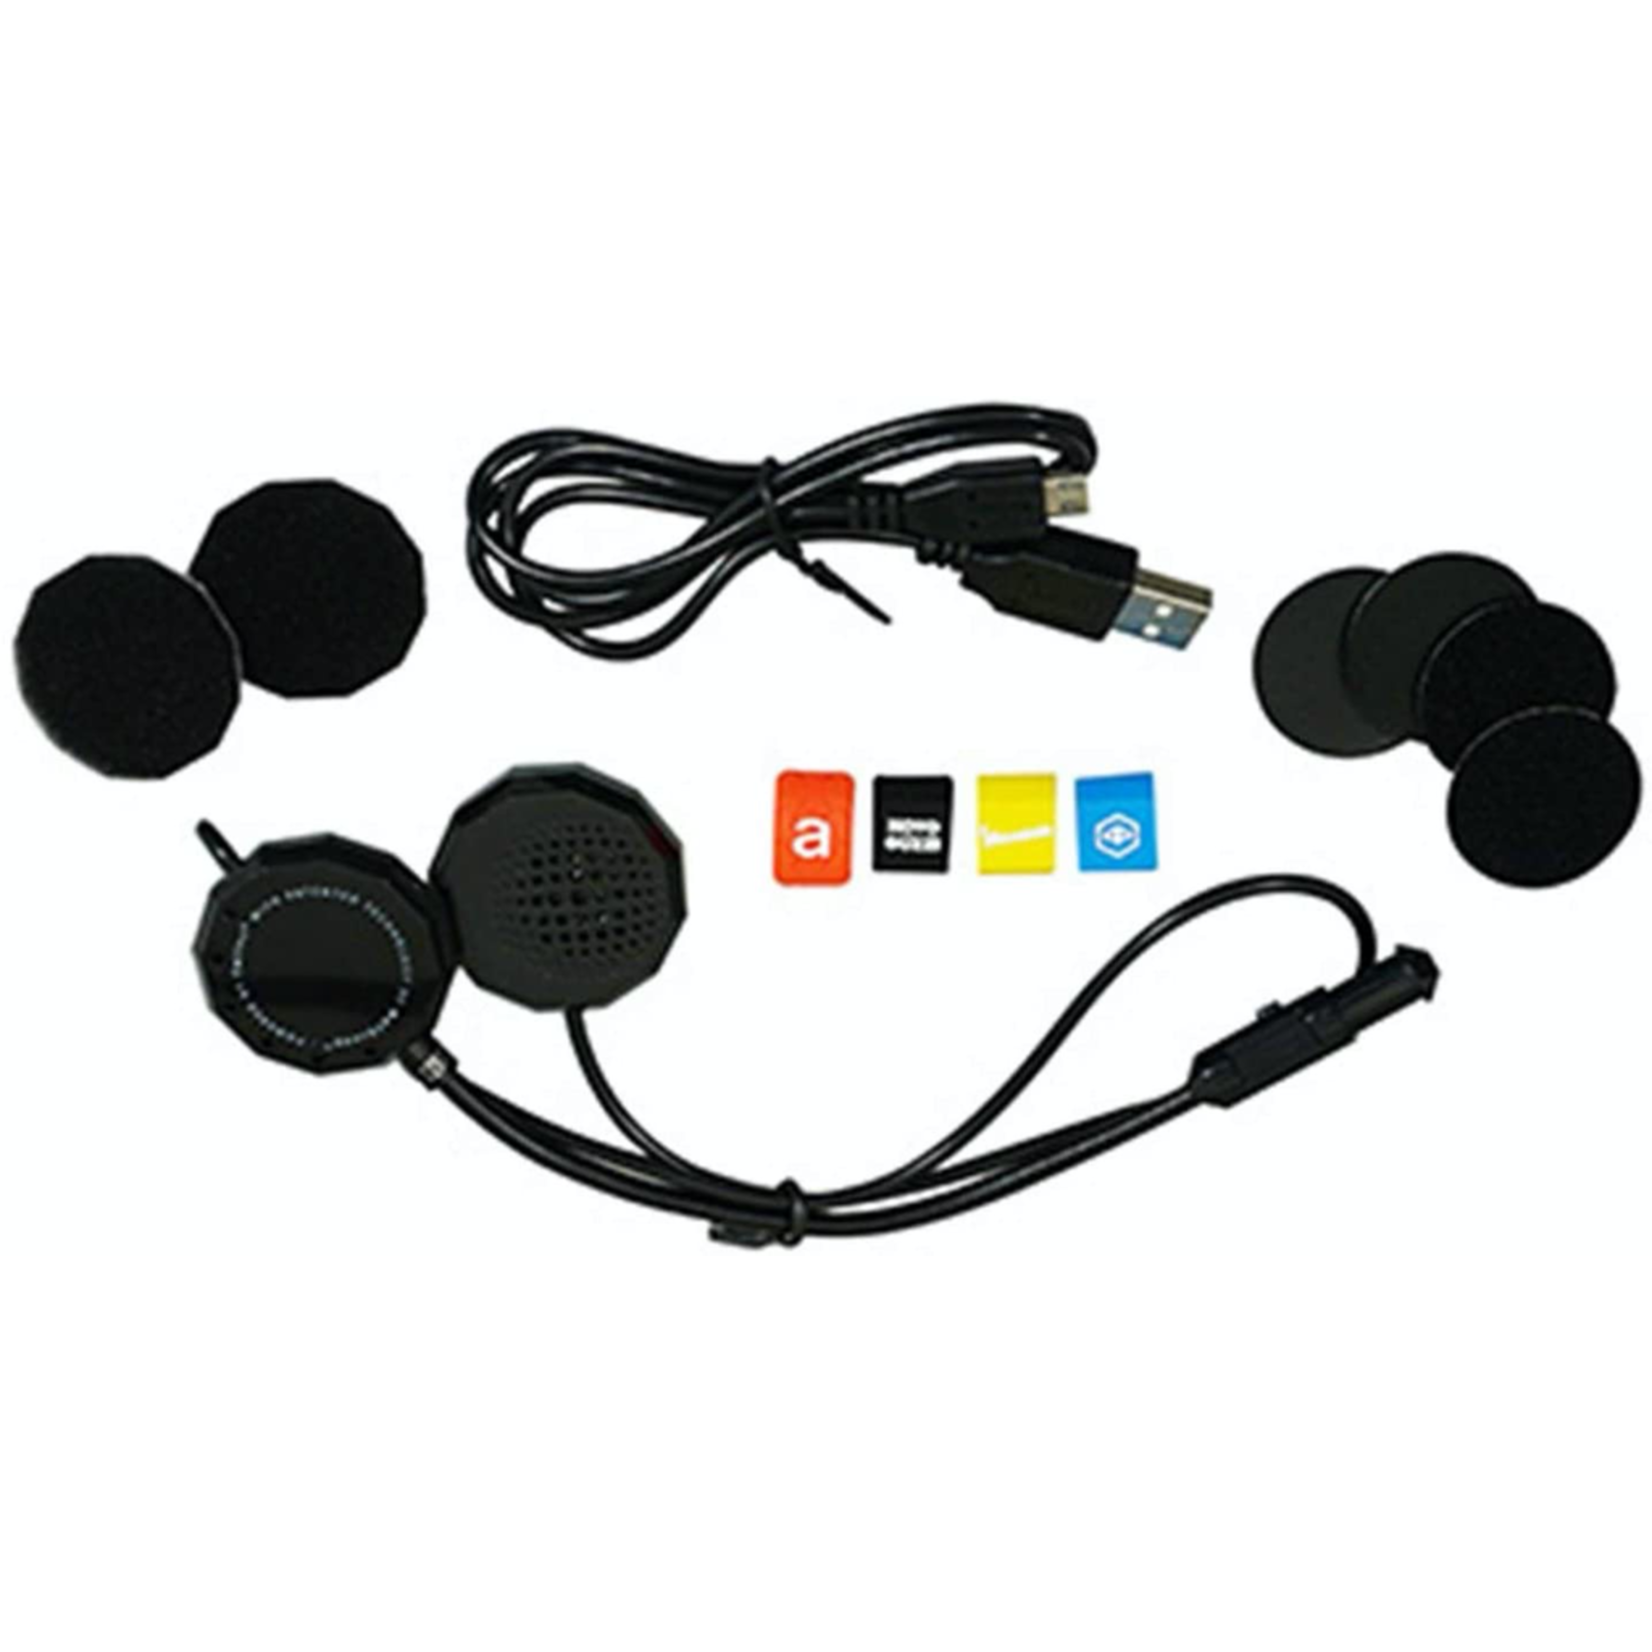 Accessories Bluetooth Communication System, Vespa OEM